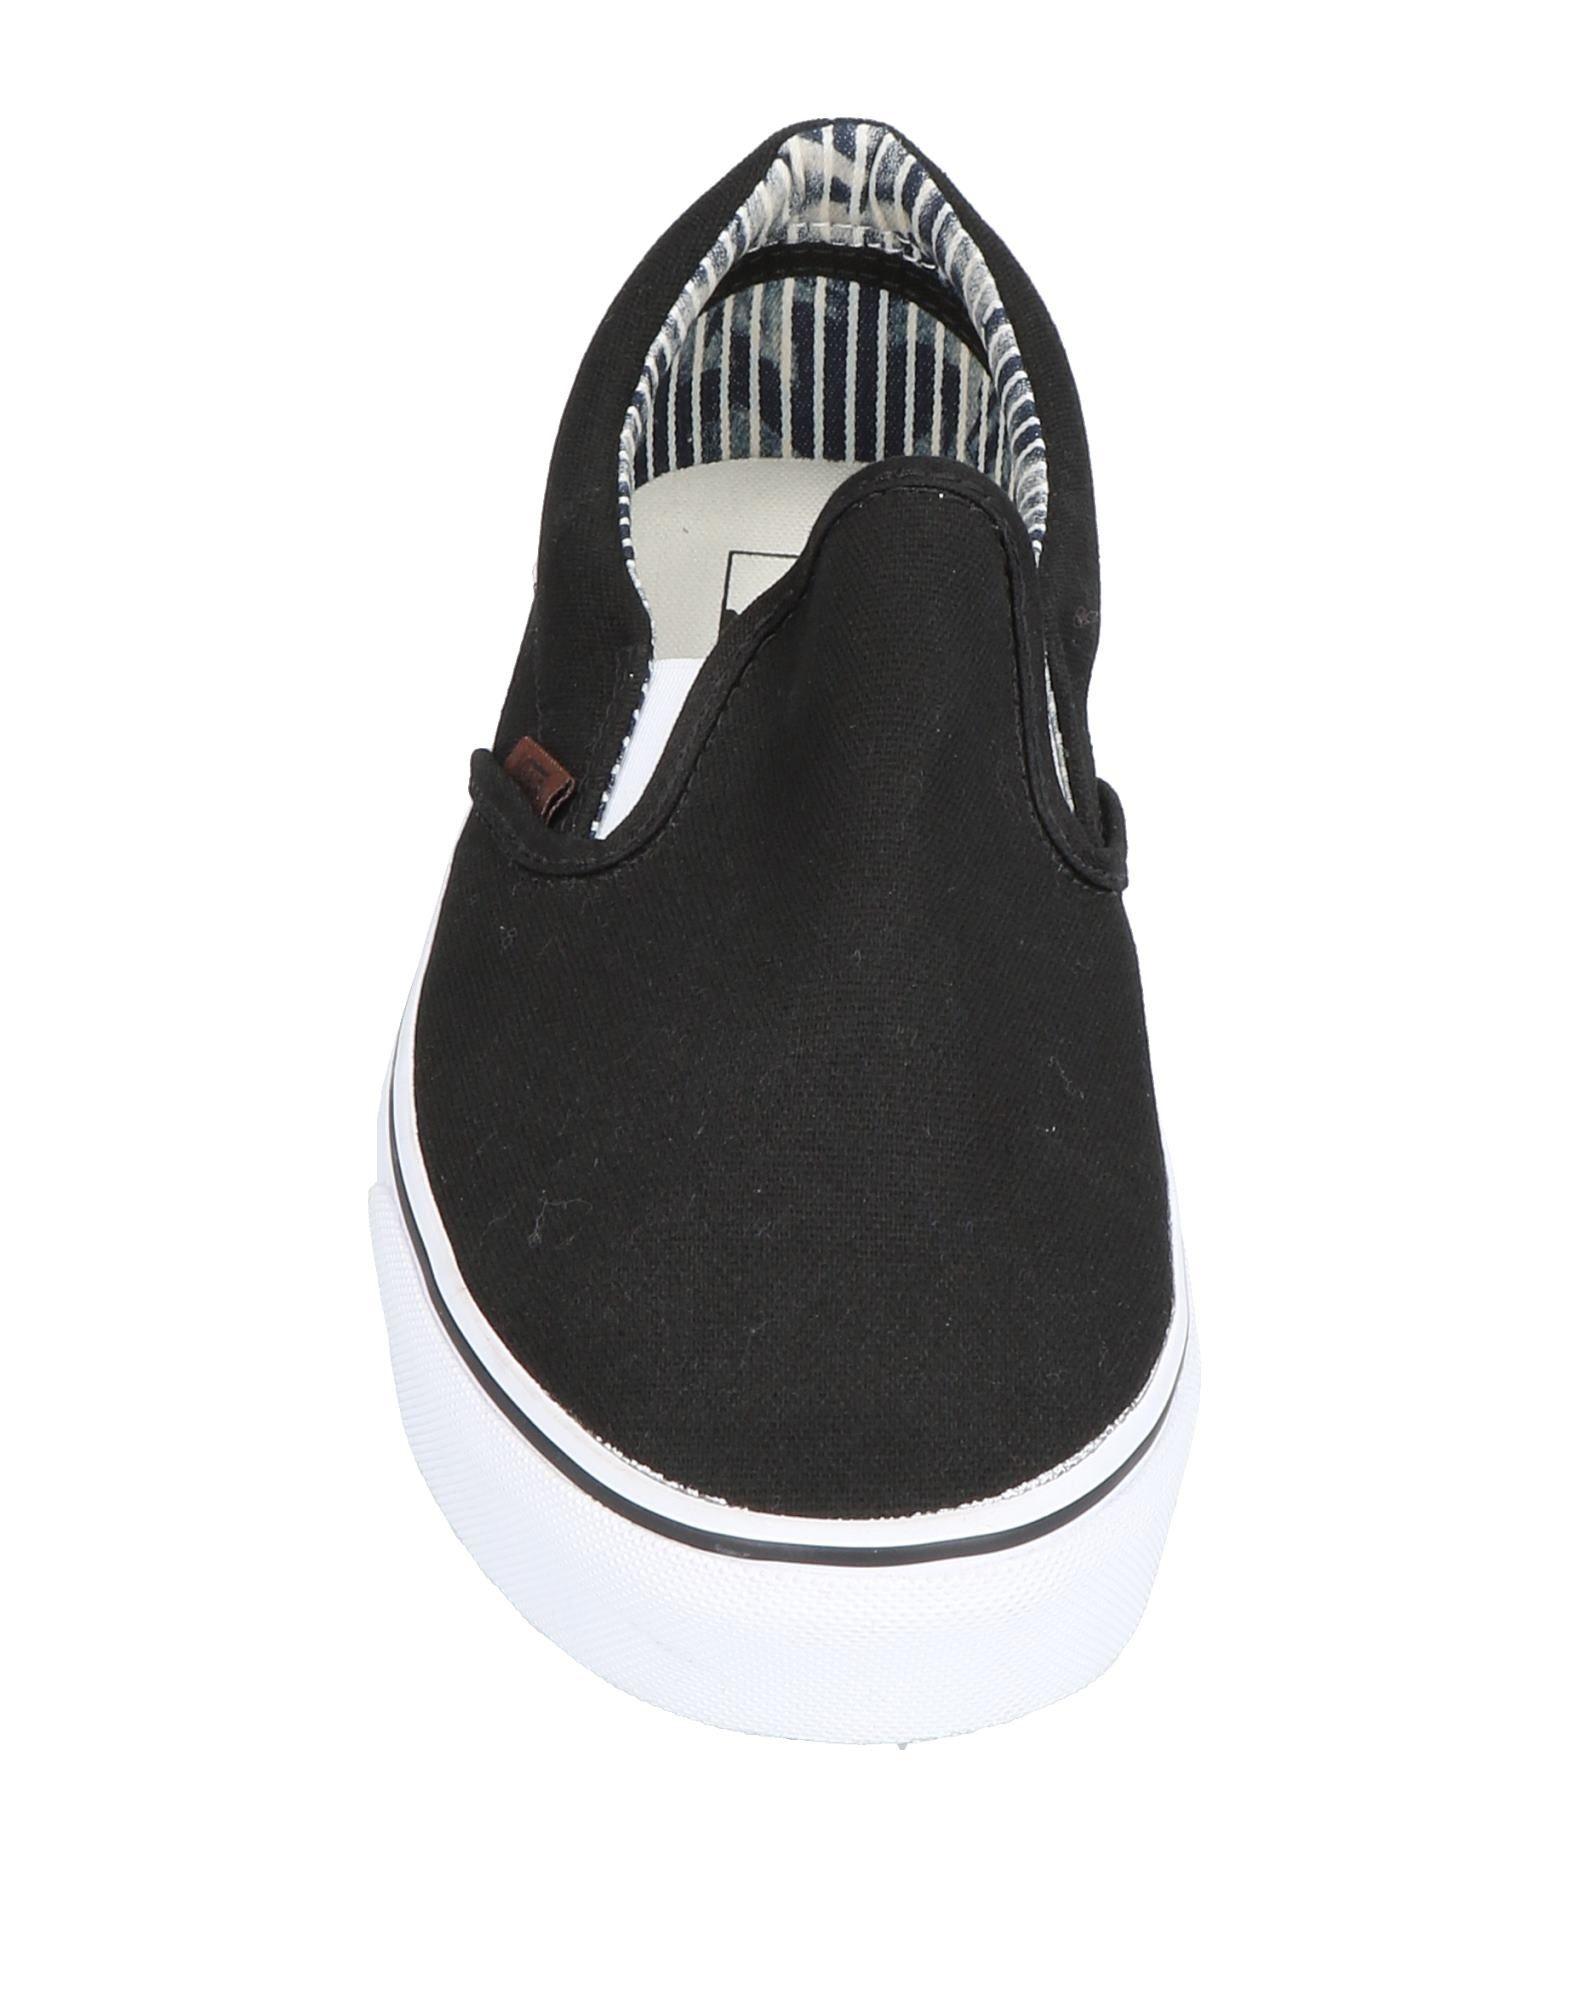 Vans Sneakers Herren  11488472OU 11488472OU  c1f210